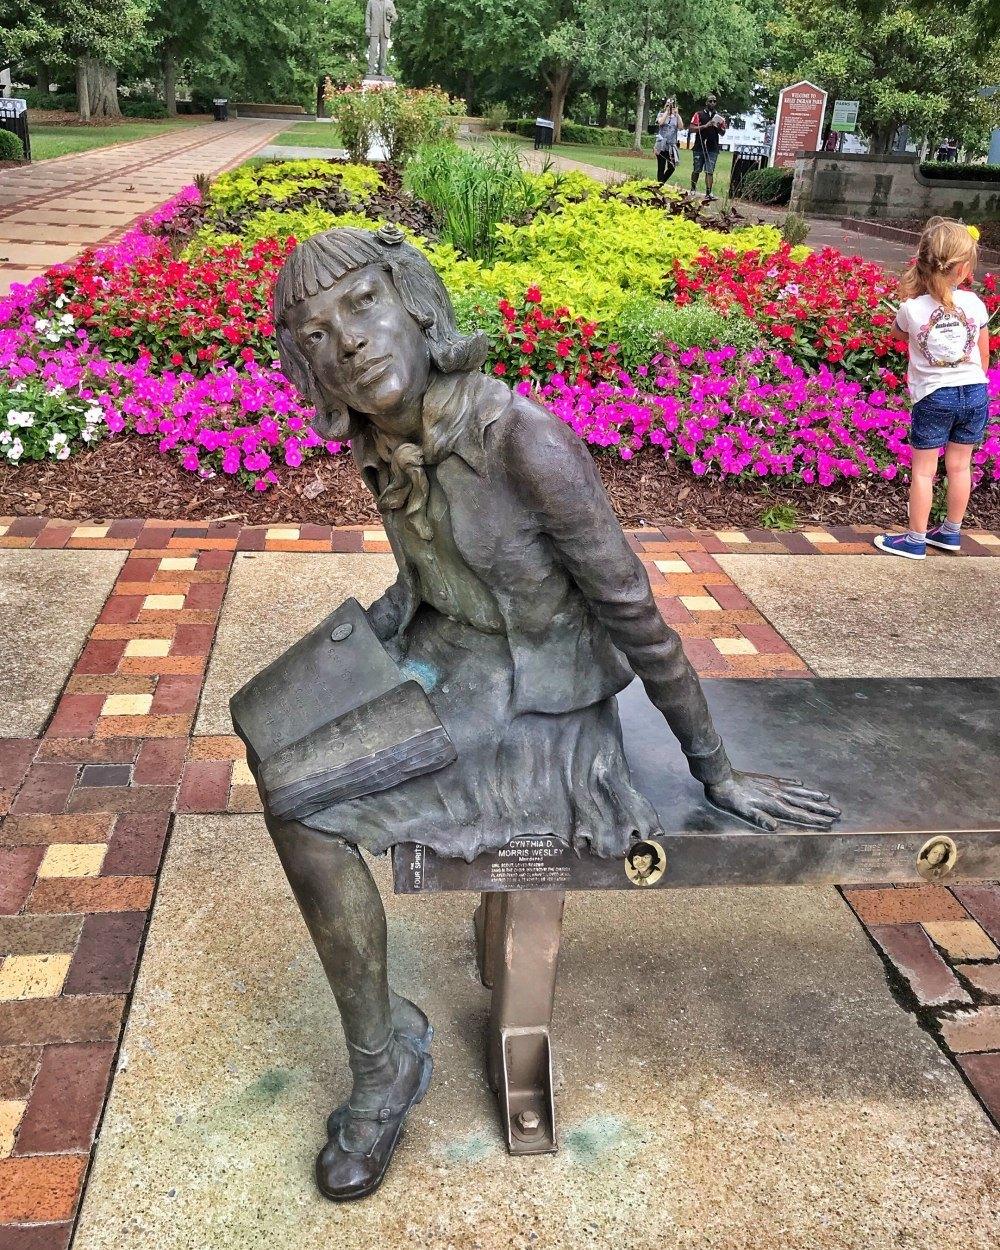 Kelly Ingram park Birmingham Alabama Photo Heatheronhertravels.com